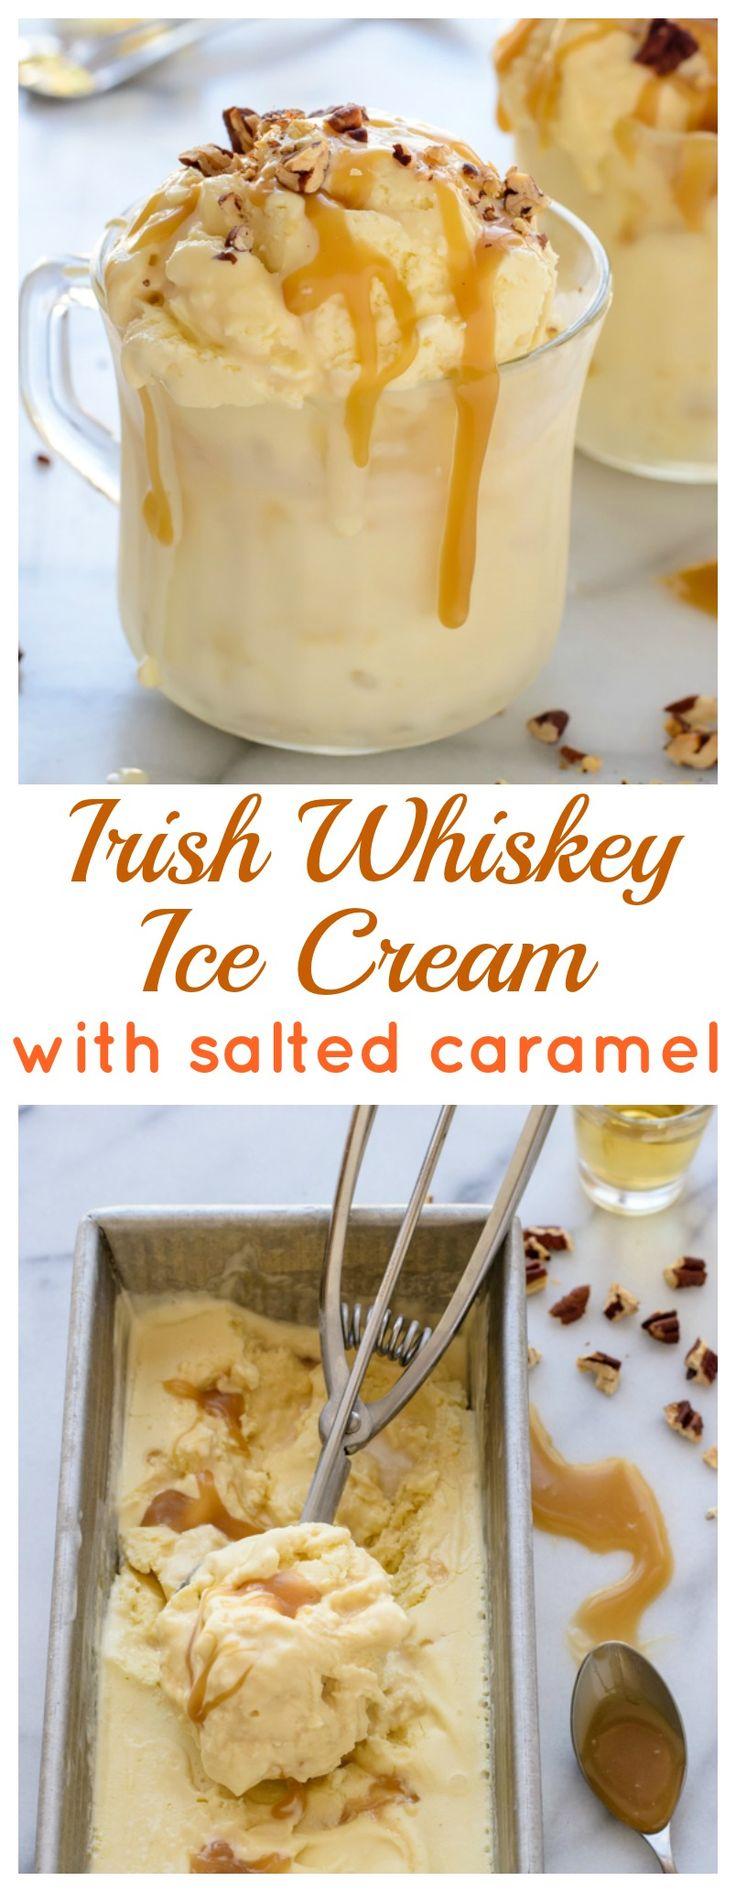 Irish Whiskey Ice Cream with Salted Caramel Swirl